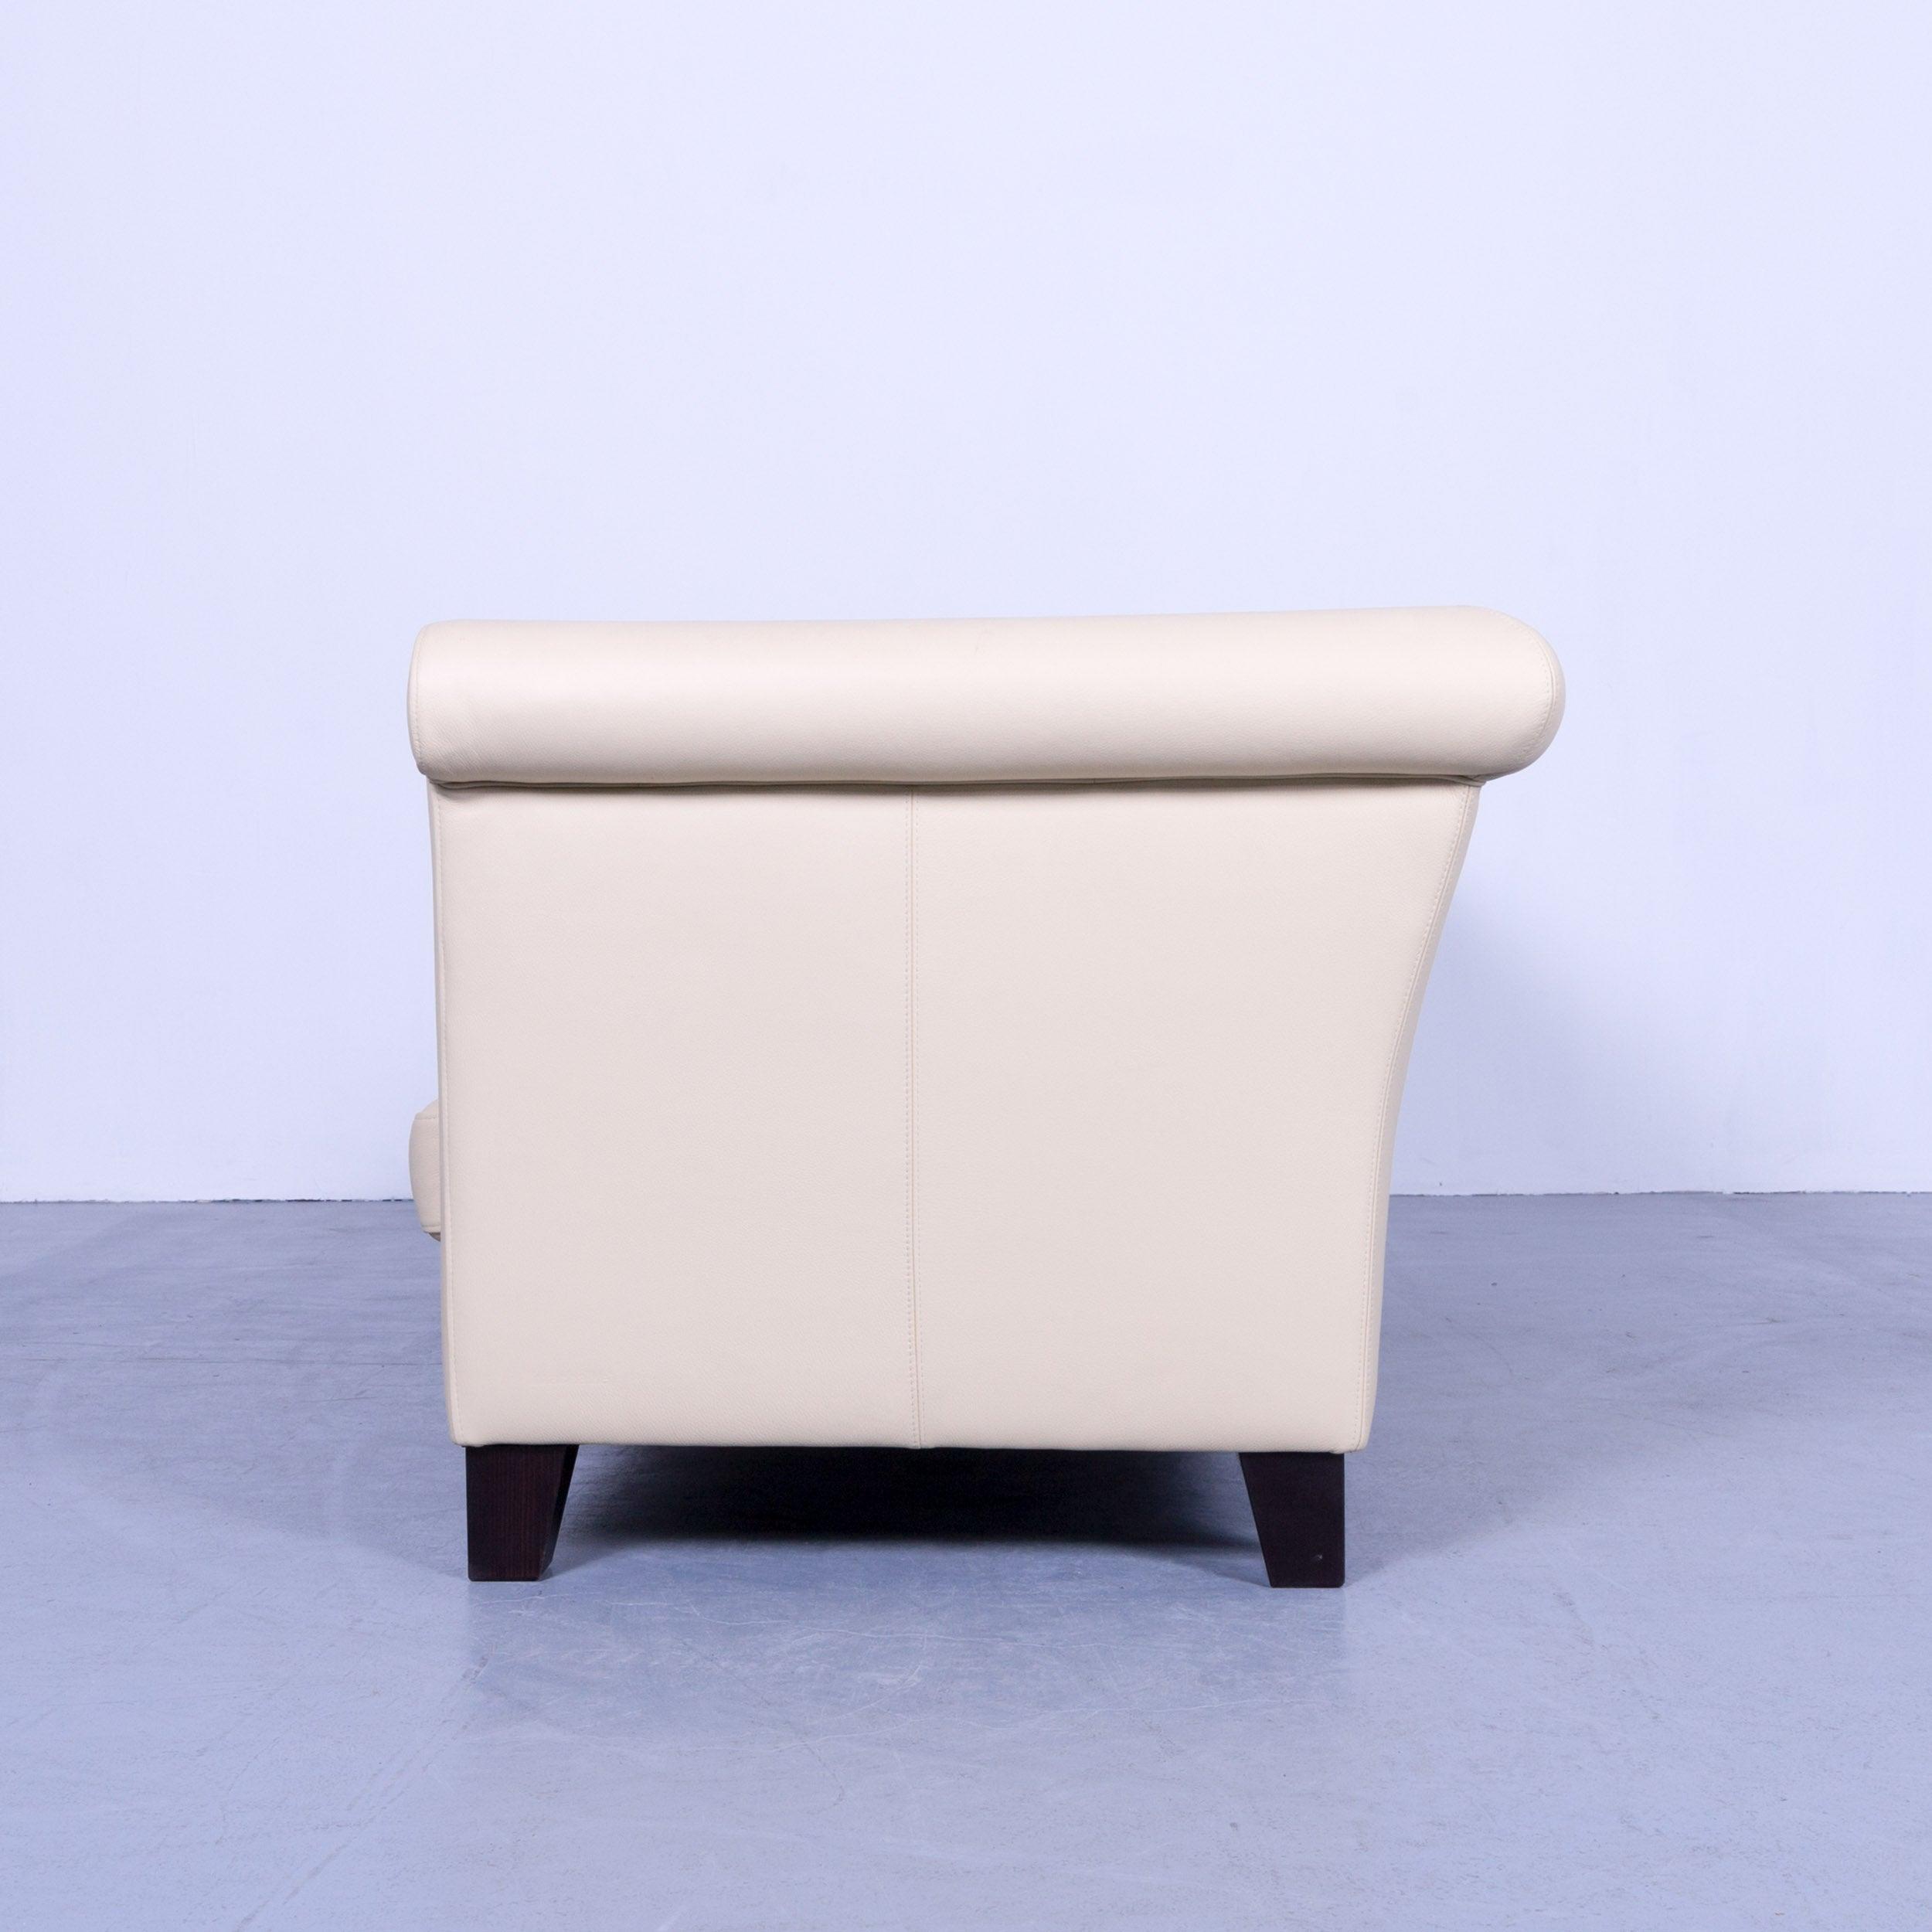 Machalke Sofas Interesting Modular Sofa Leather Seater With